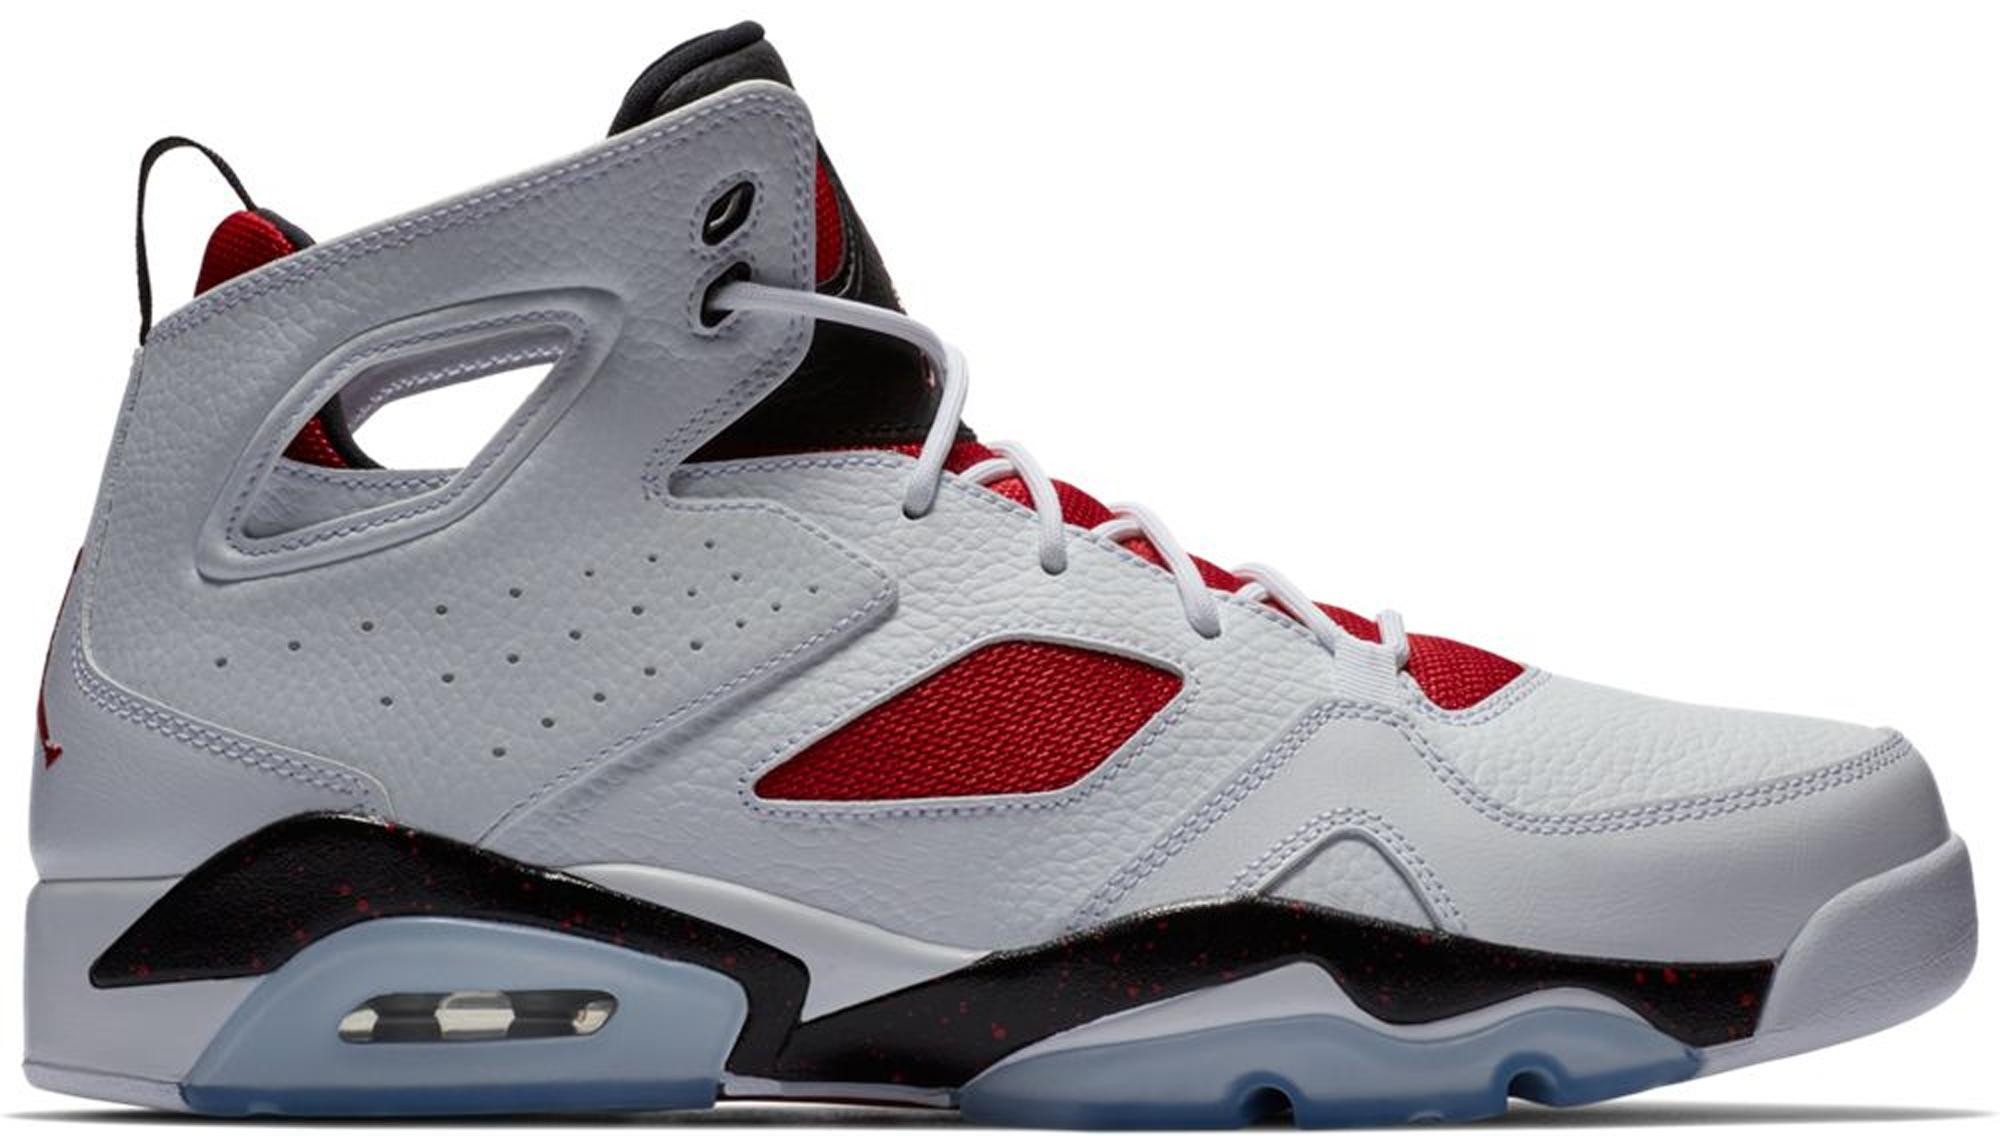 7caf3634 Lyst - Nike Flightclub 91 White Black Gym Red in Red for Men